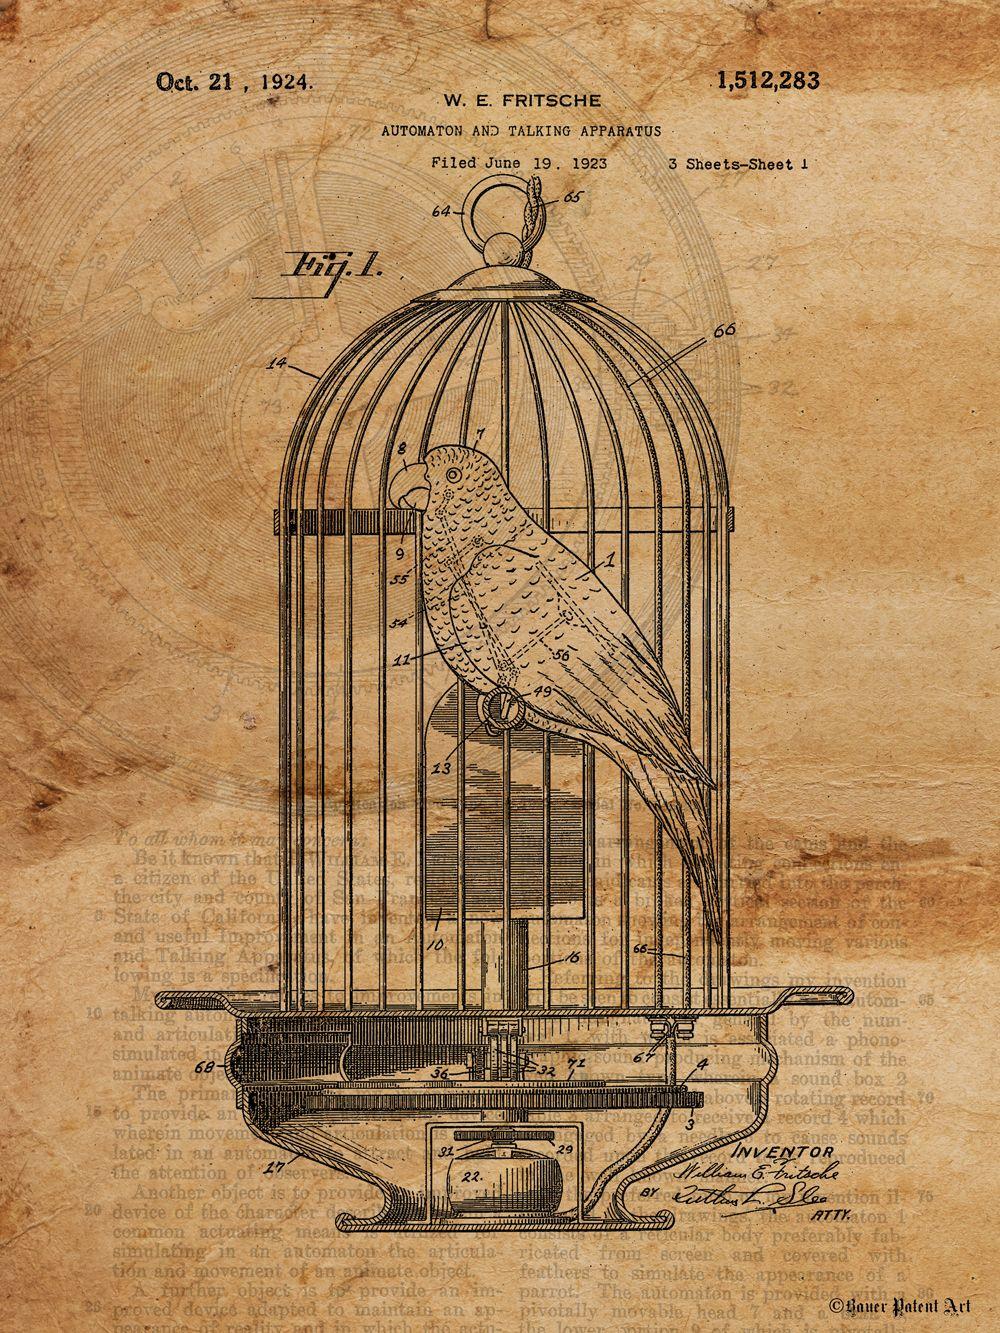 Vintage Patent Art Drawing Of Mechanical Bird In Birdcage Patent Art Patent Drawing Patent Art Prints